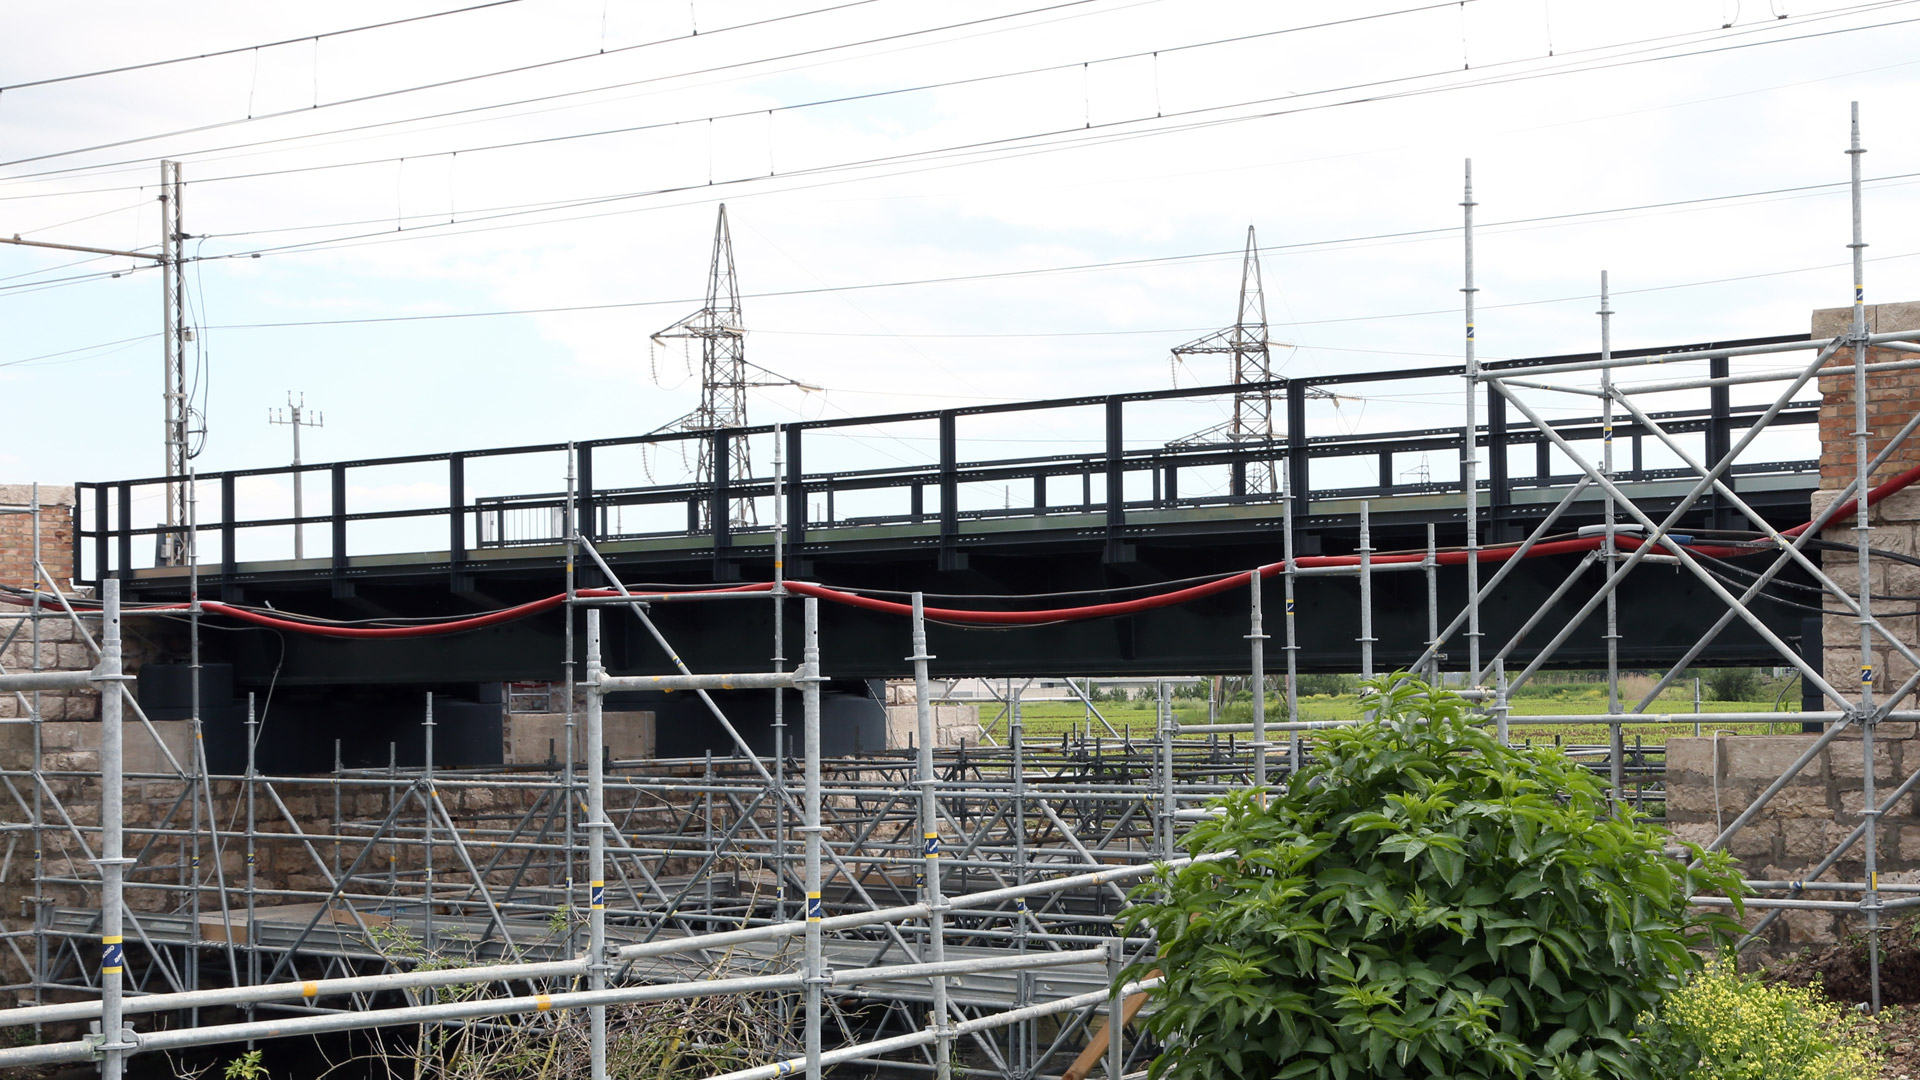 ponte-ferroviario-fiume-cavata-metal-engineering-carpenteria-civile-vista-laterale